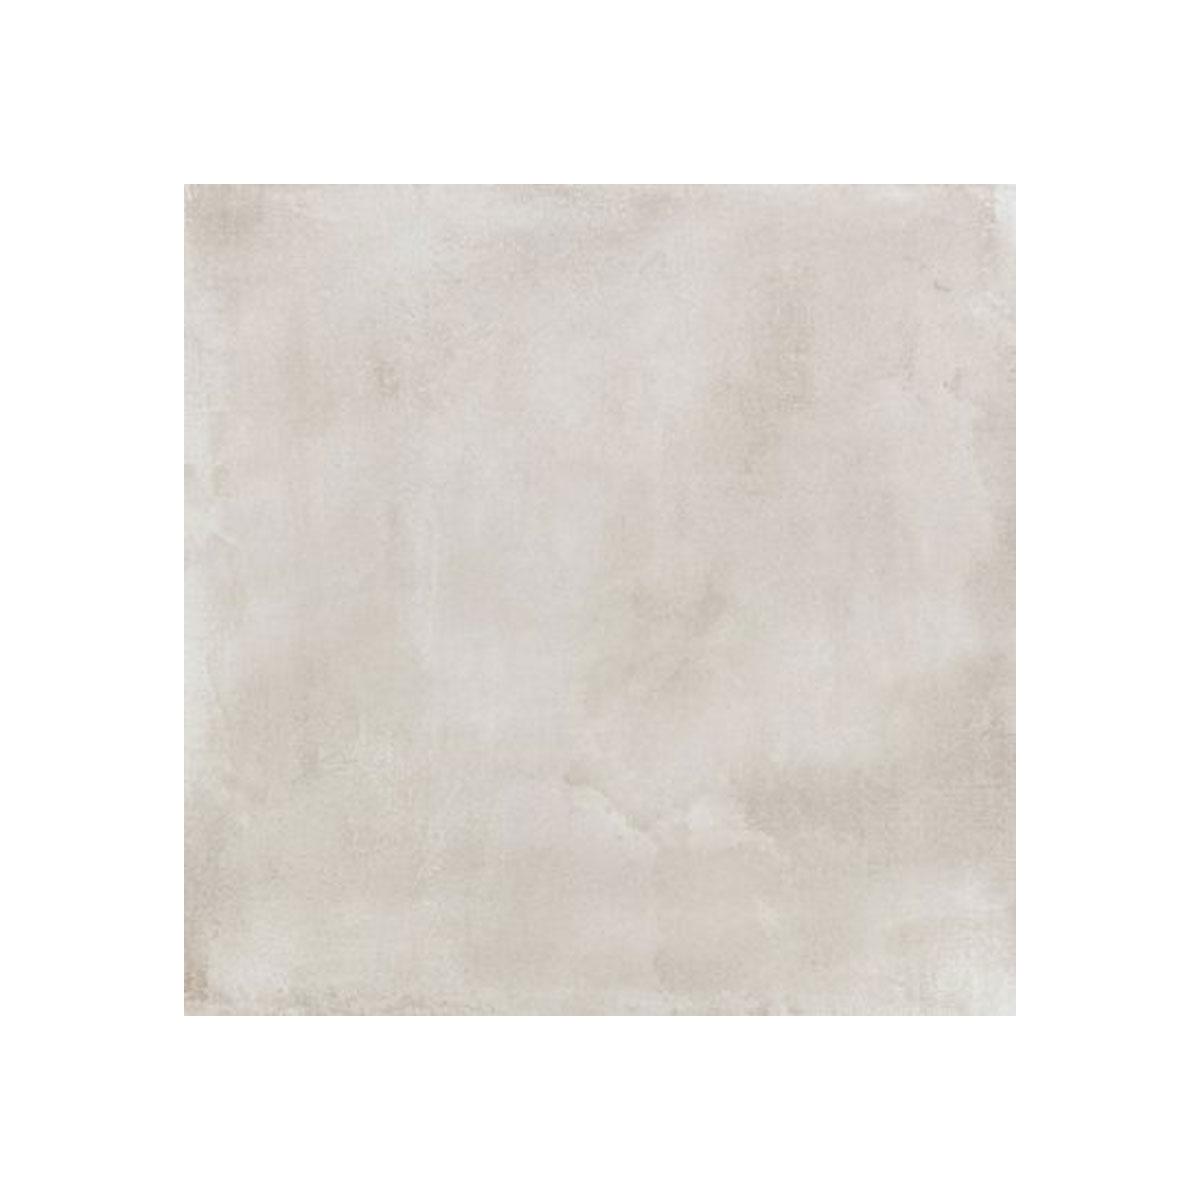 Basic Concrete - Grey - 600x600mm - Concrete Look Tiles - Stone3 Brisbane